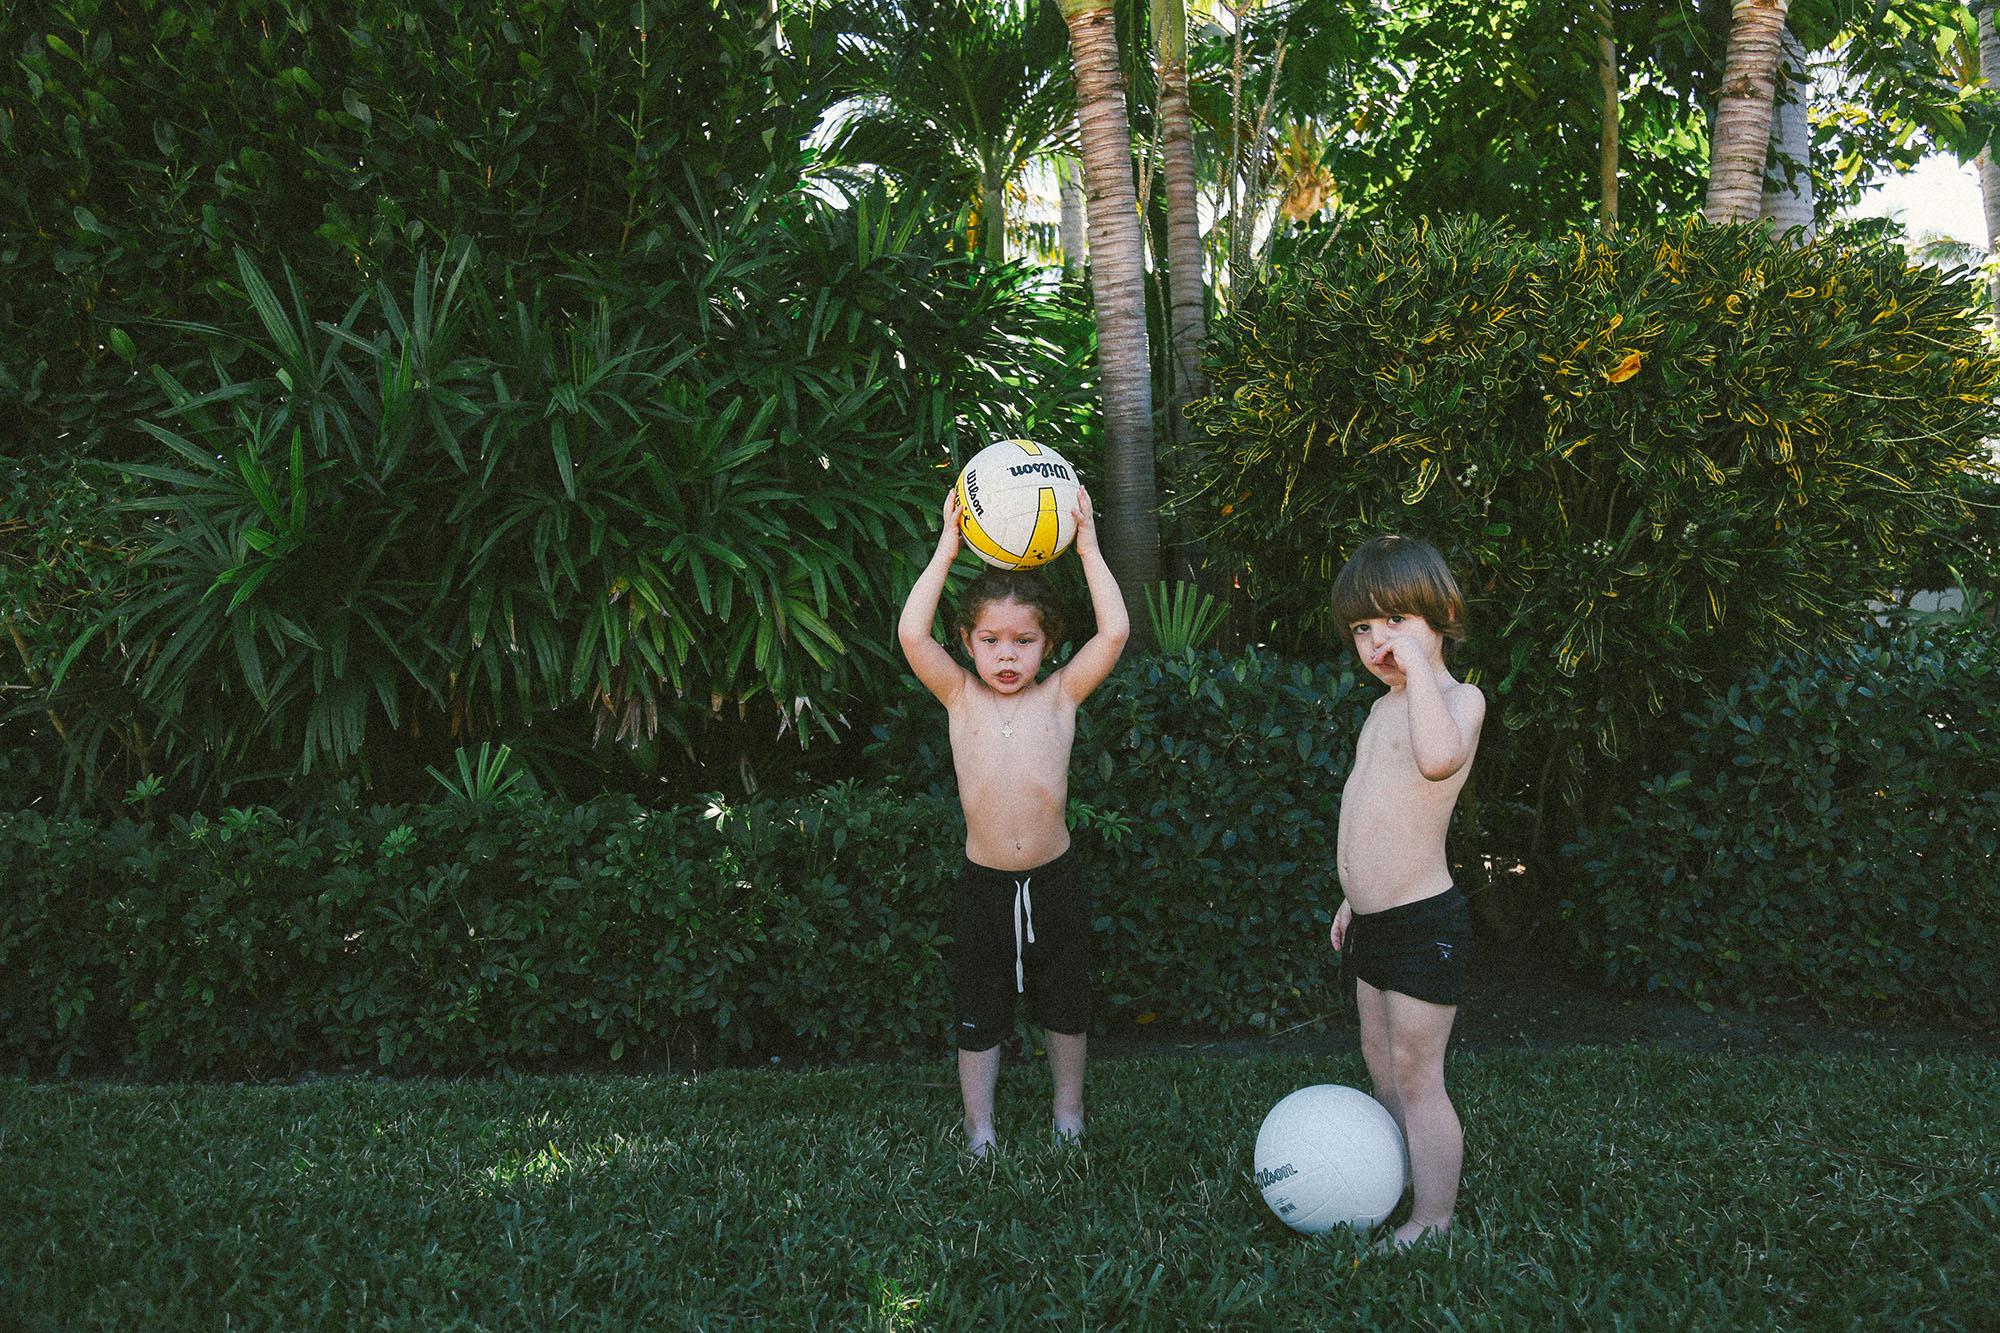 nhl_all_star_break_miami_toddlers79.jpg